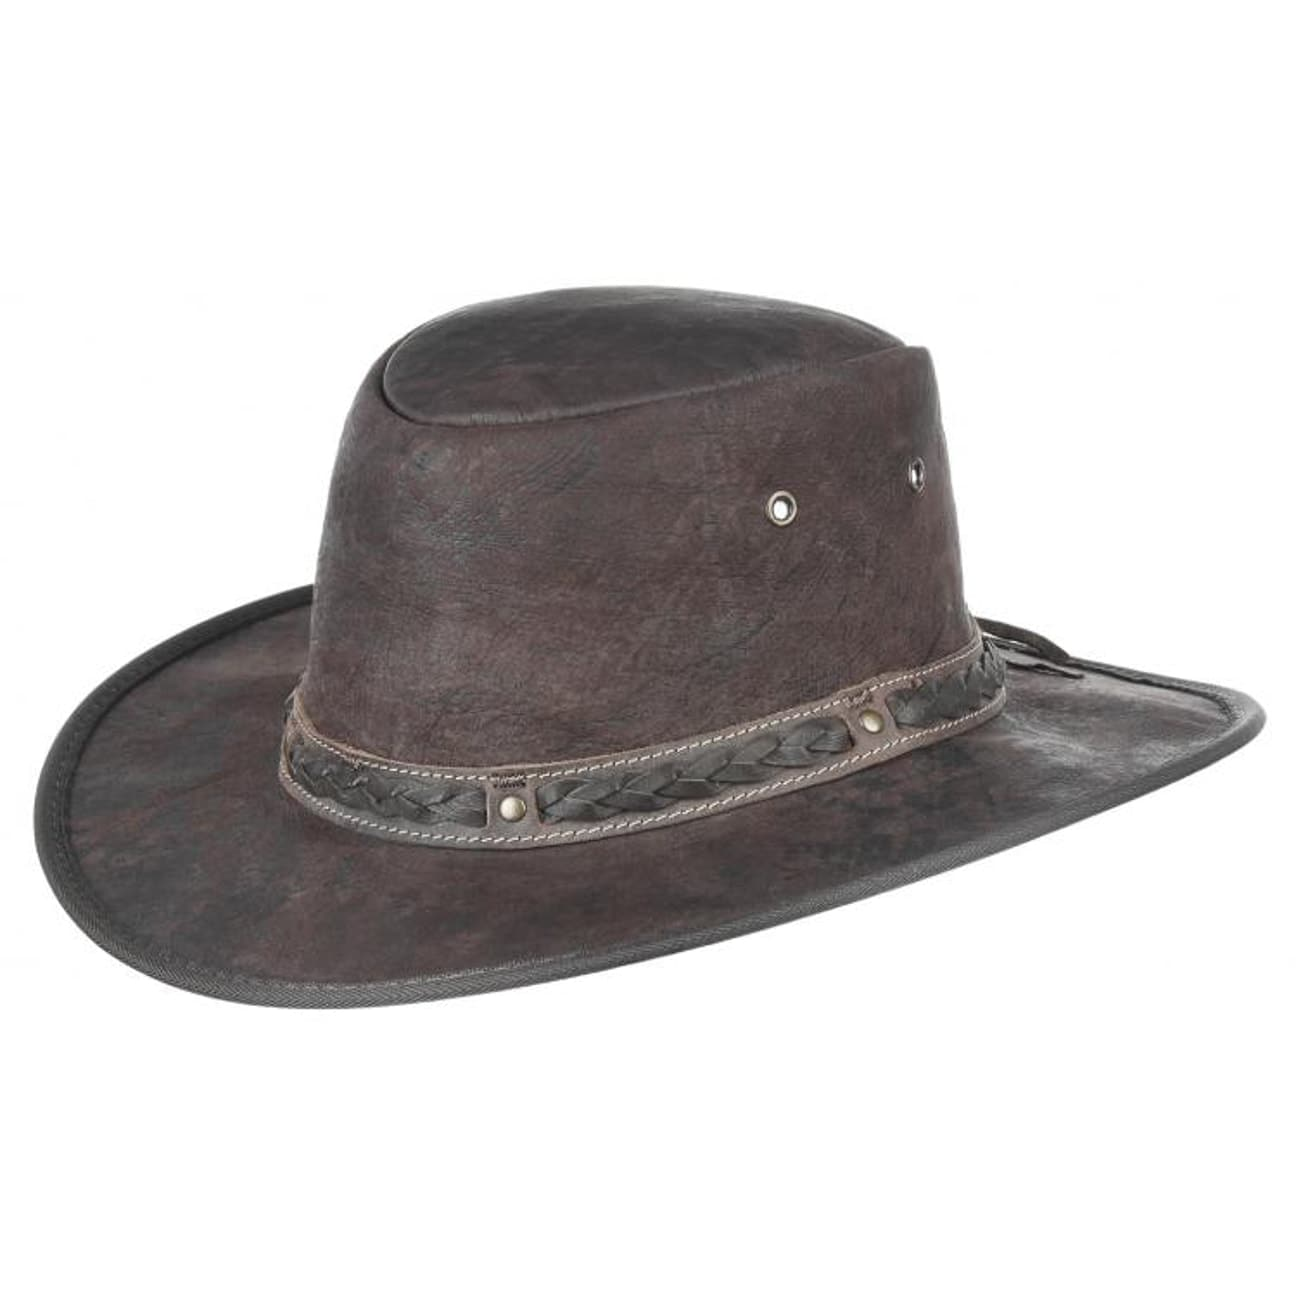 sombrero-piel-sundowner-by-scippis